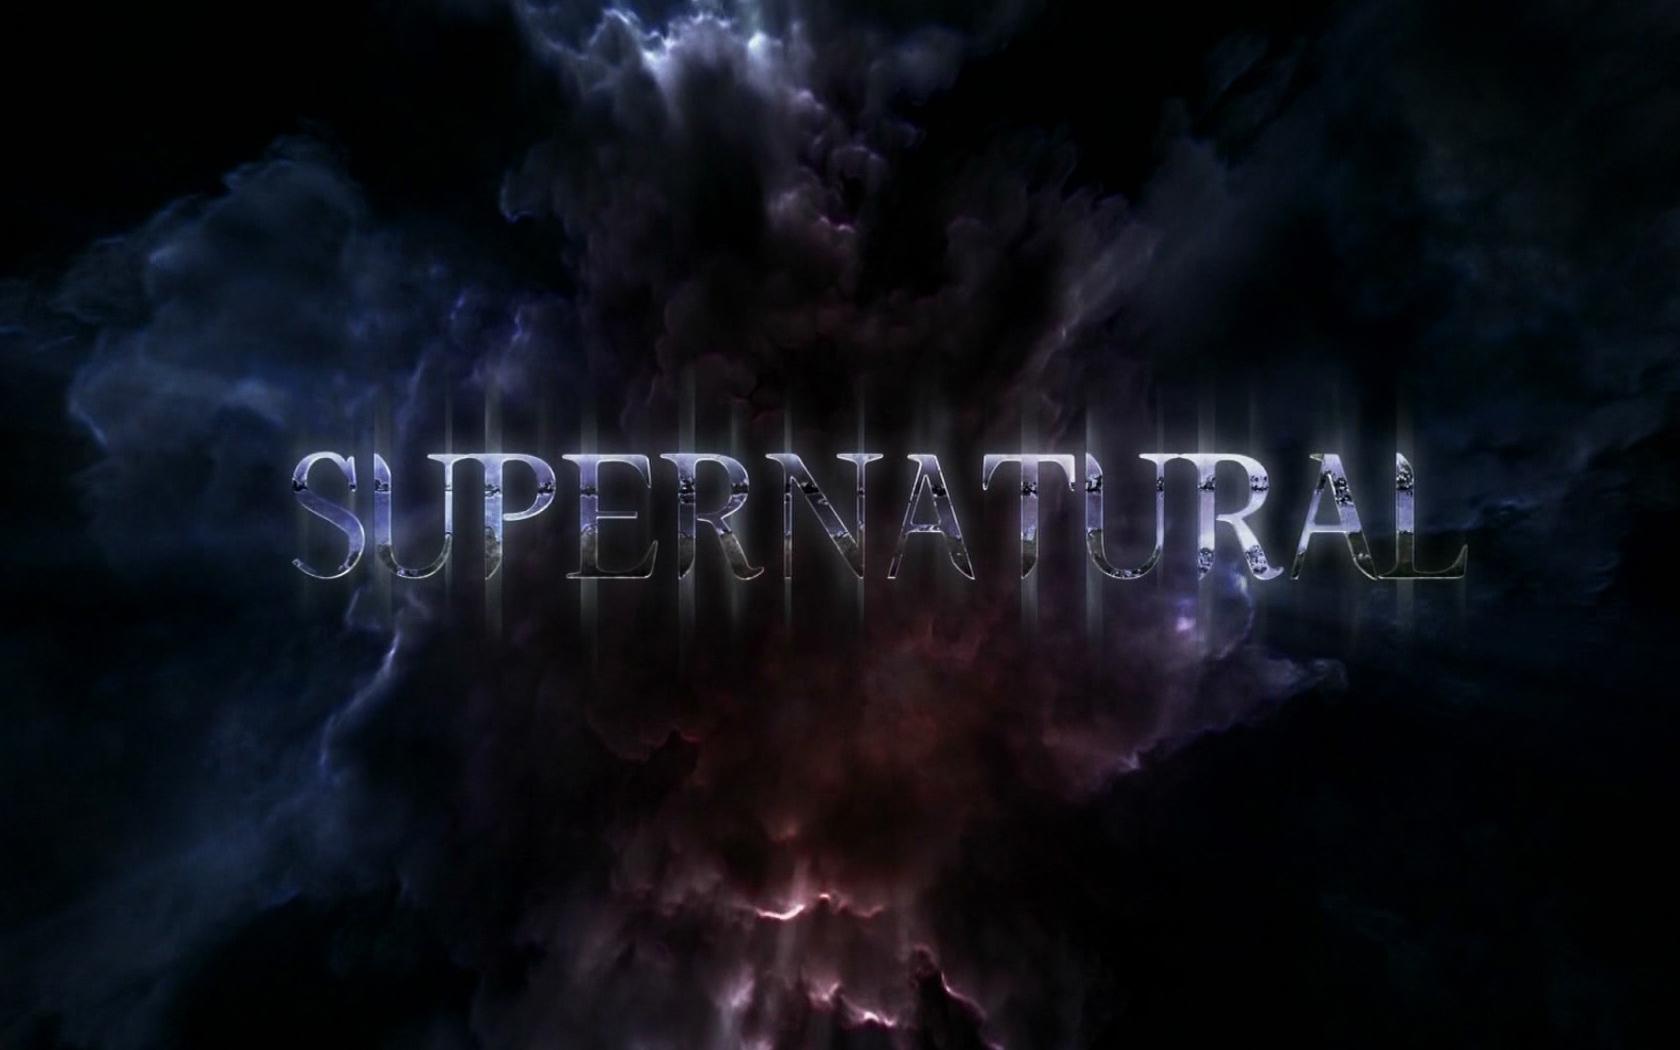 Supernatural Wallpaper 1680x1050 Supernatural 1680x1050